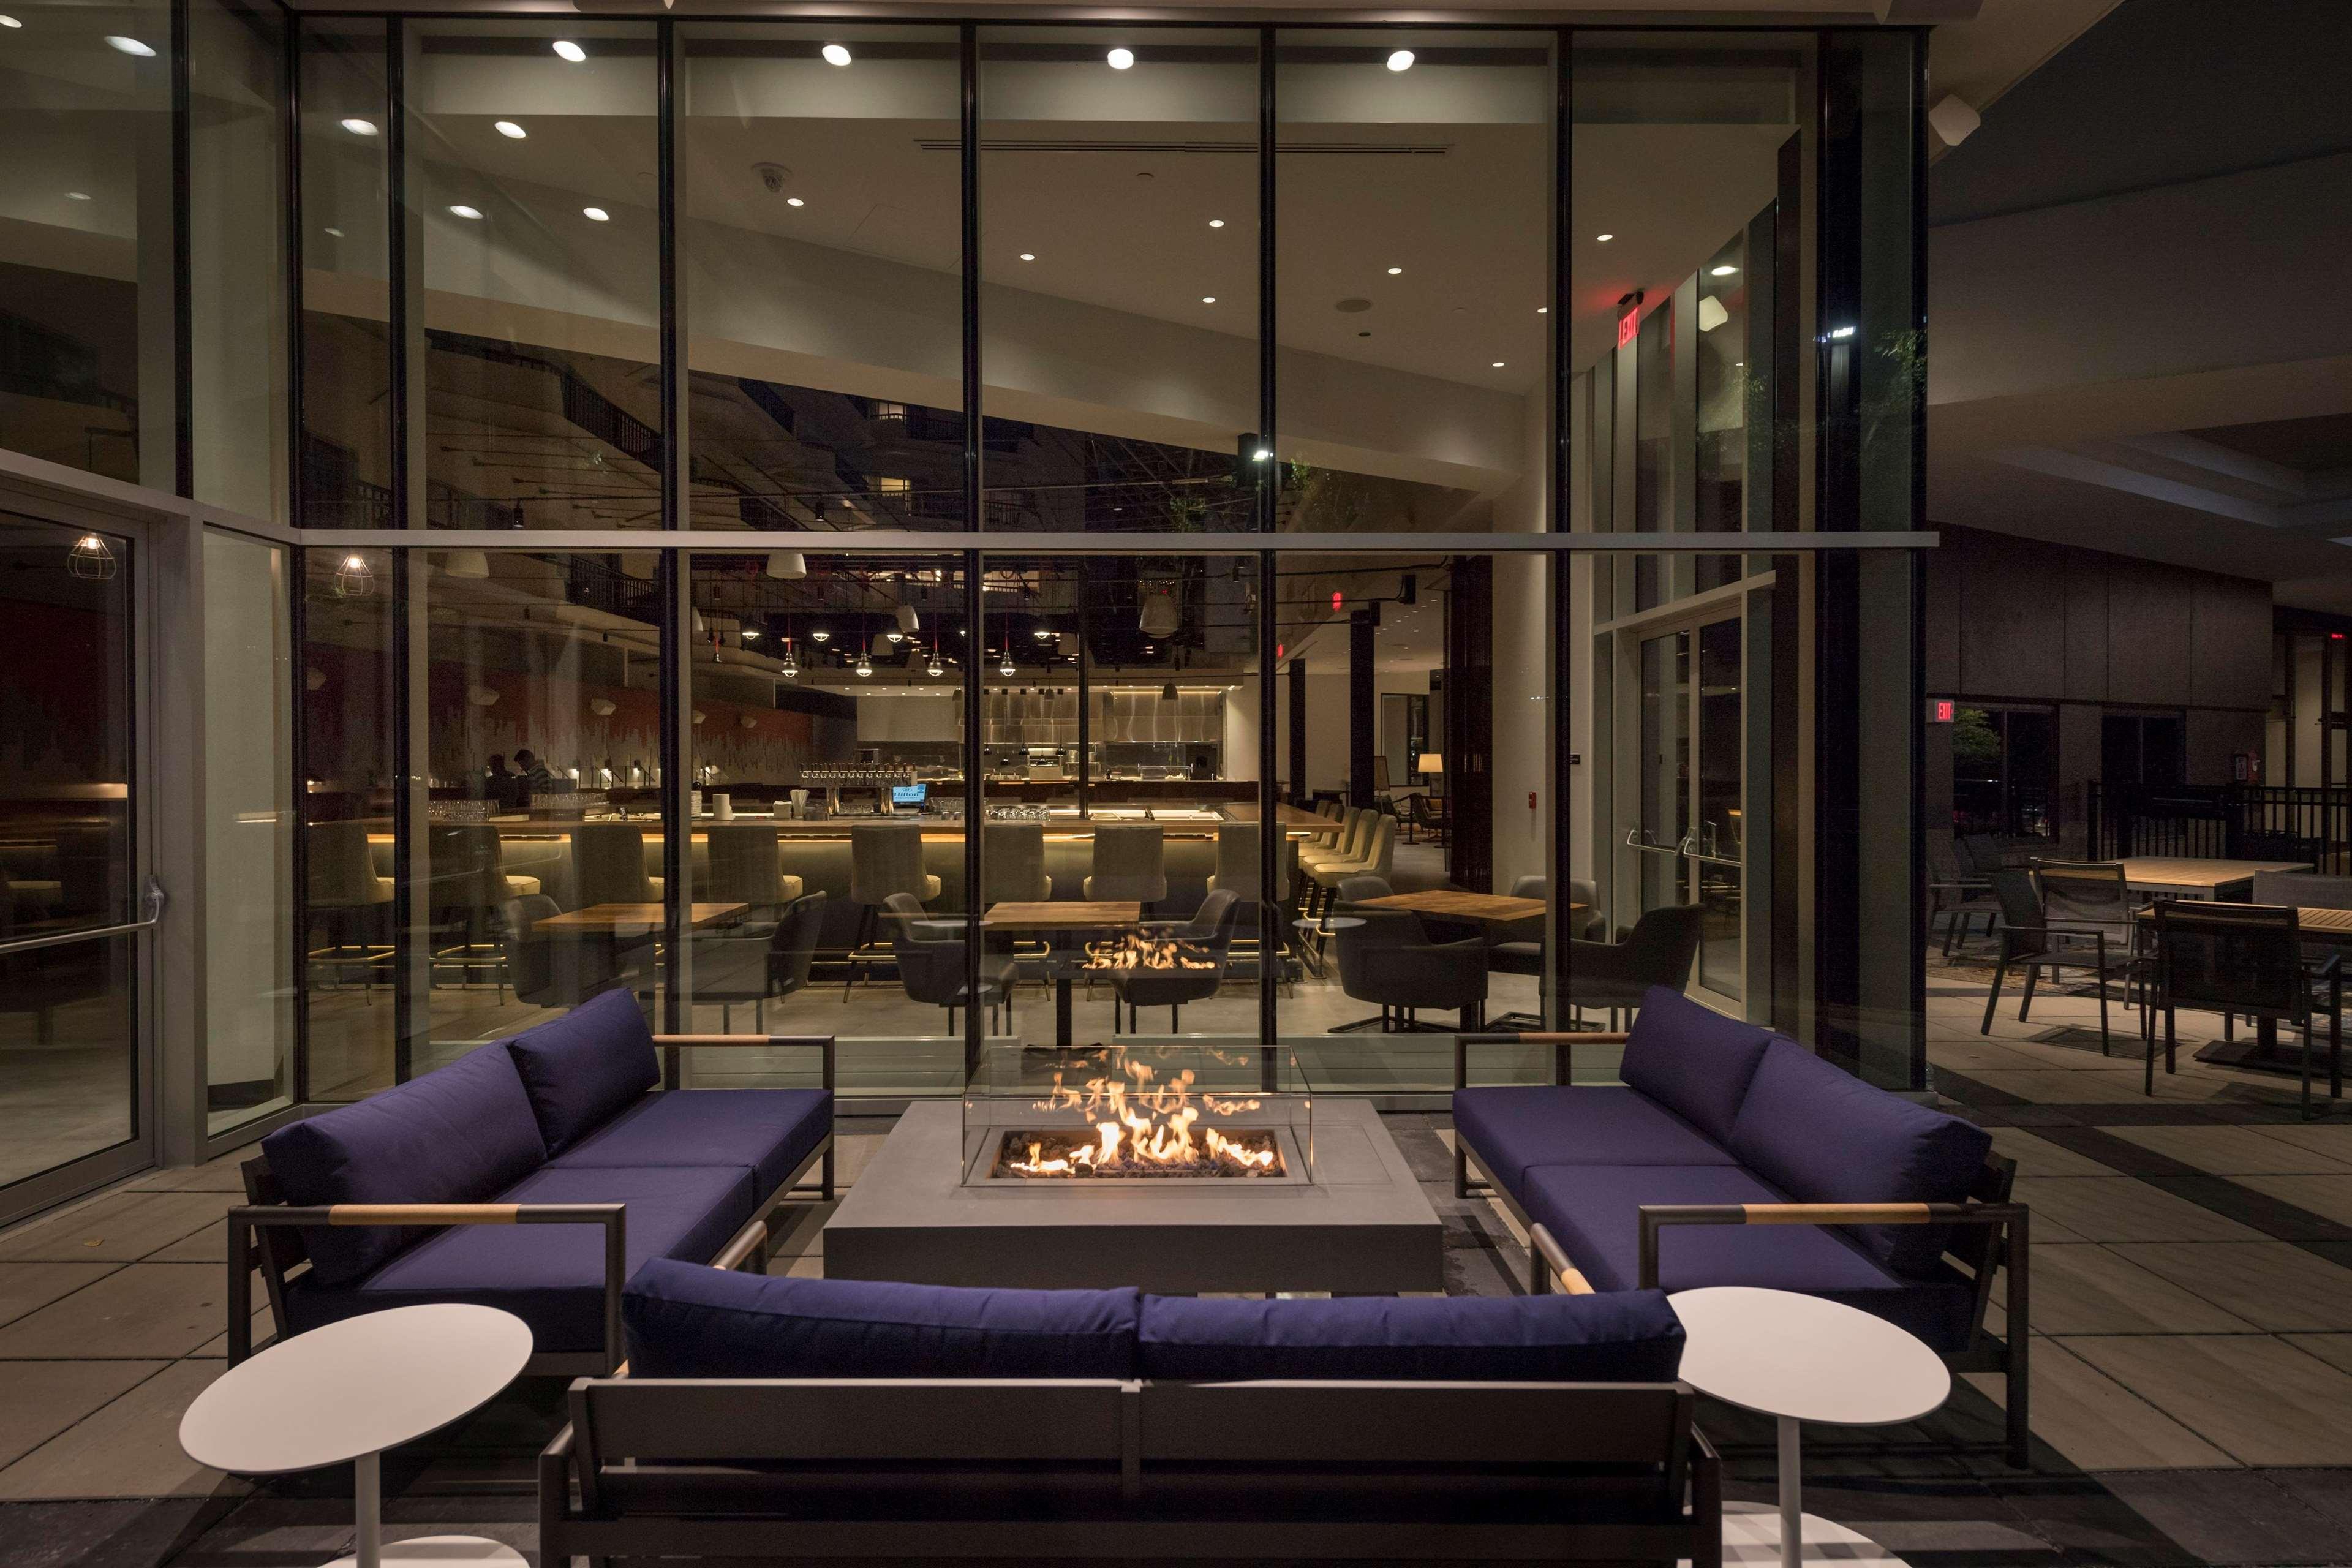 hilton boston woburn in woburn ma 01801. Black Bedroom Furniture Sets. Home Design Ideas